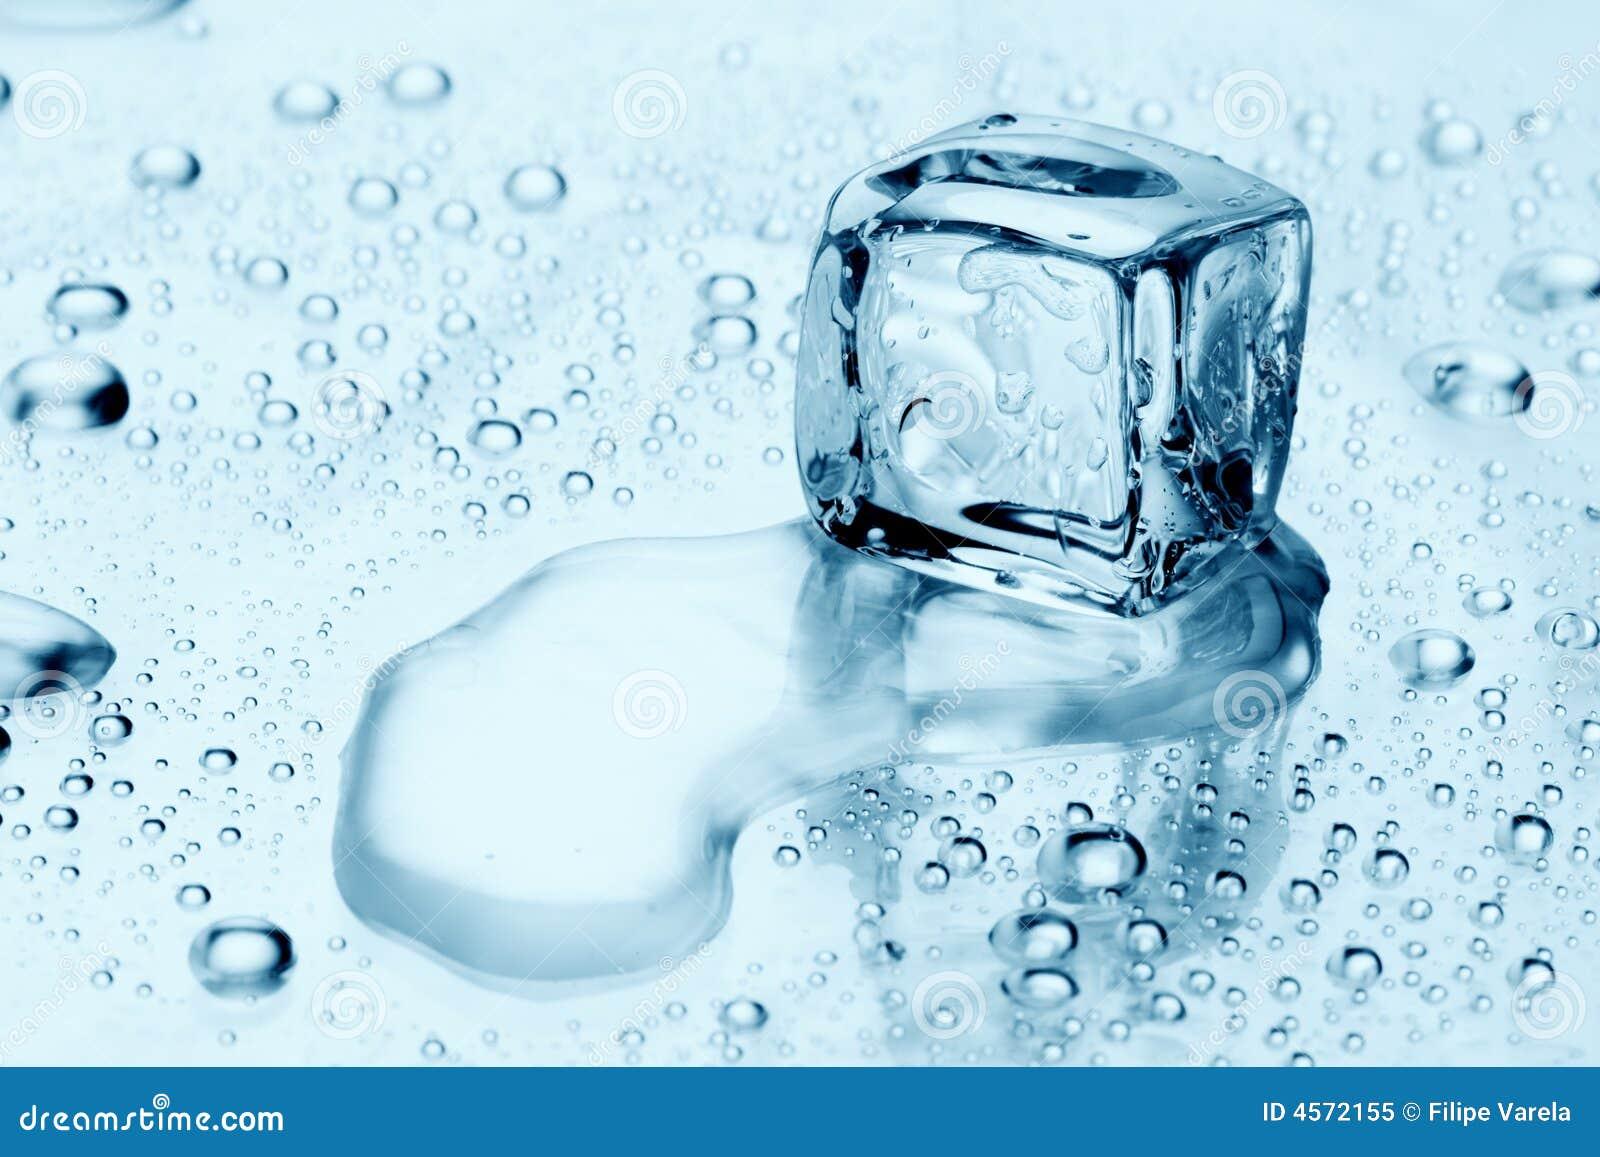 hielo agua: